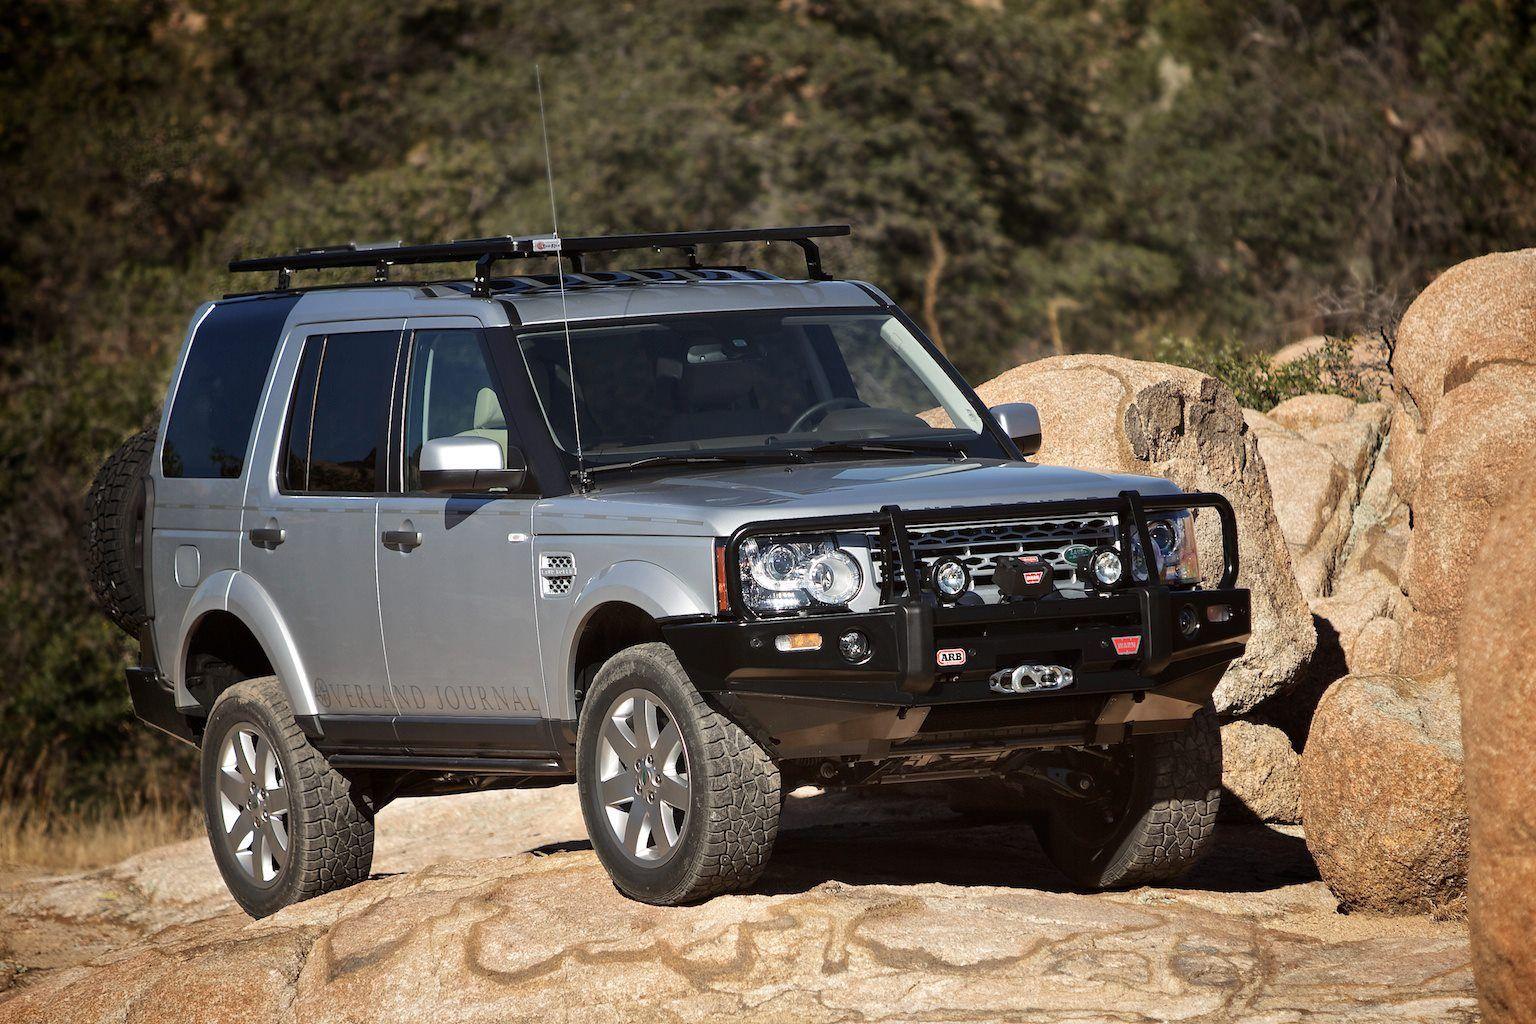 Land Rover Discovery 4 Lr4 Land Rover Land Rover Discovery